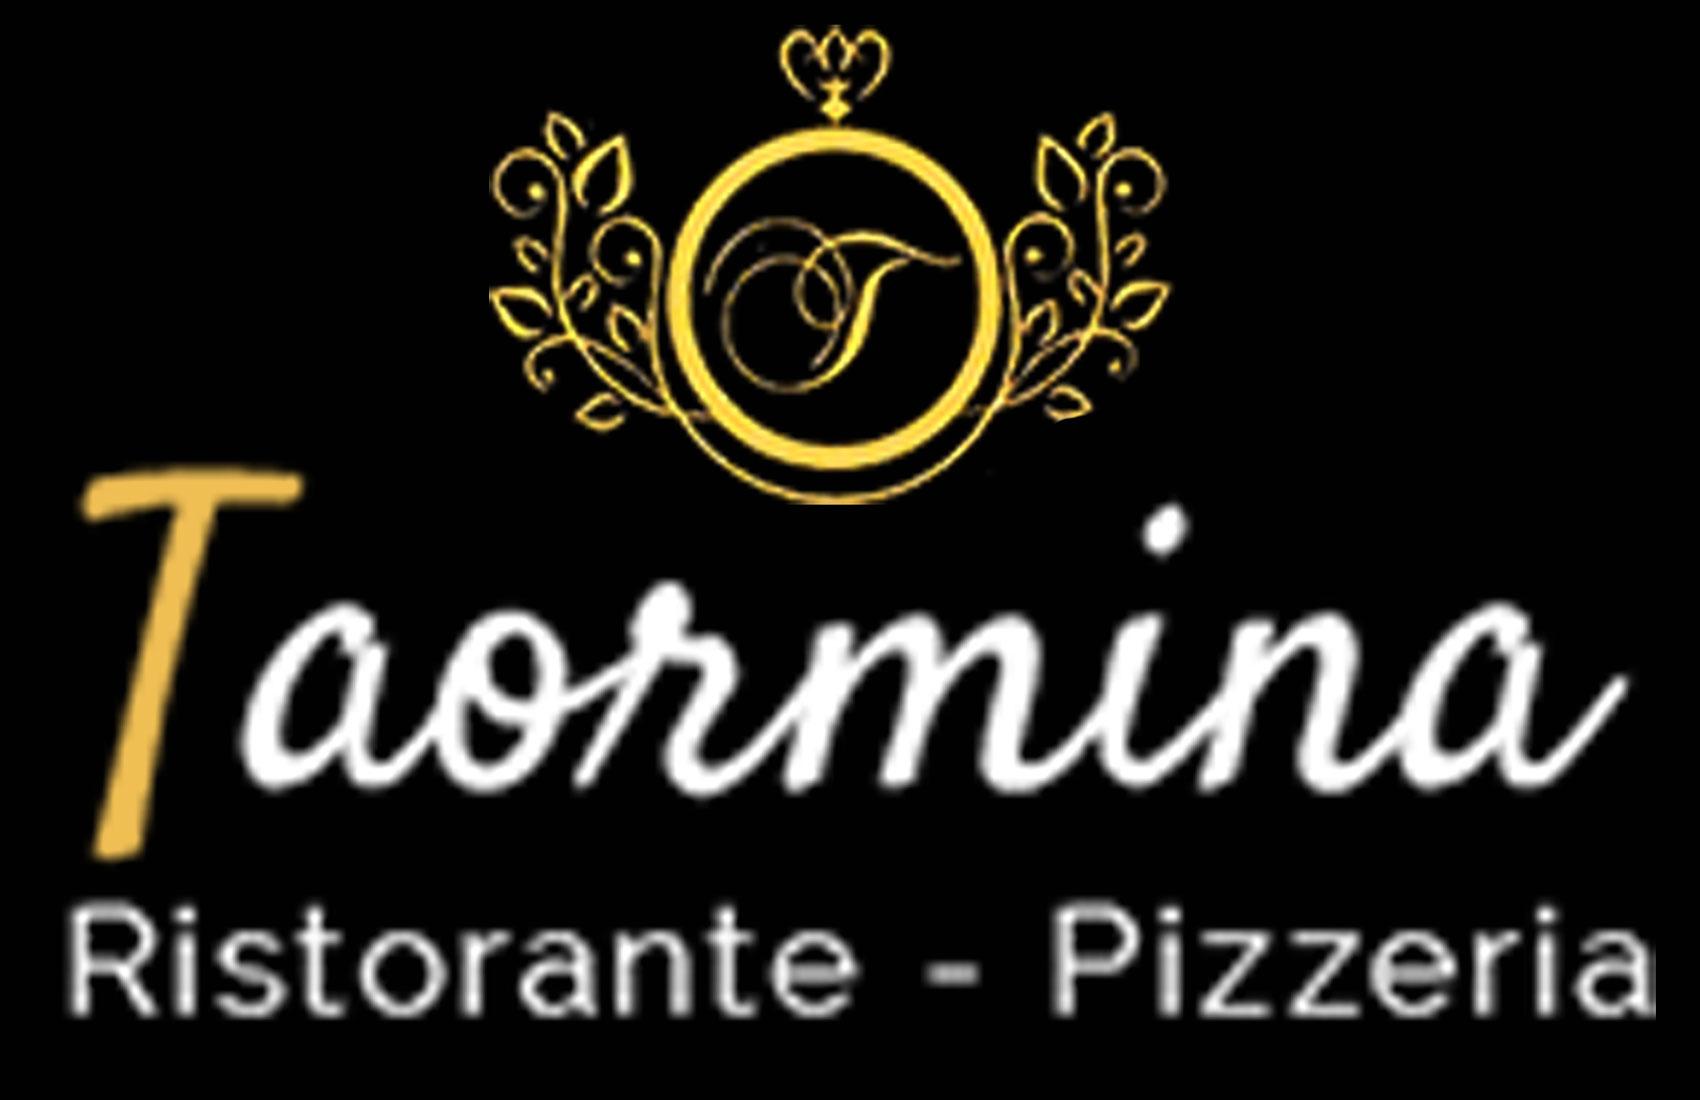 Taormina Ristorante Pizzeria